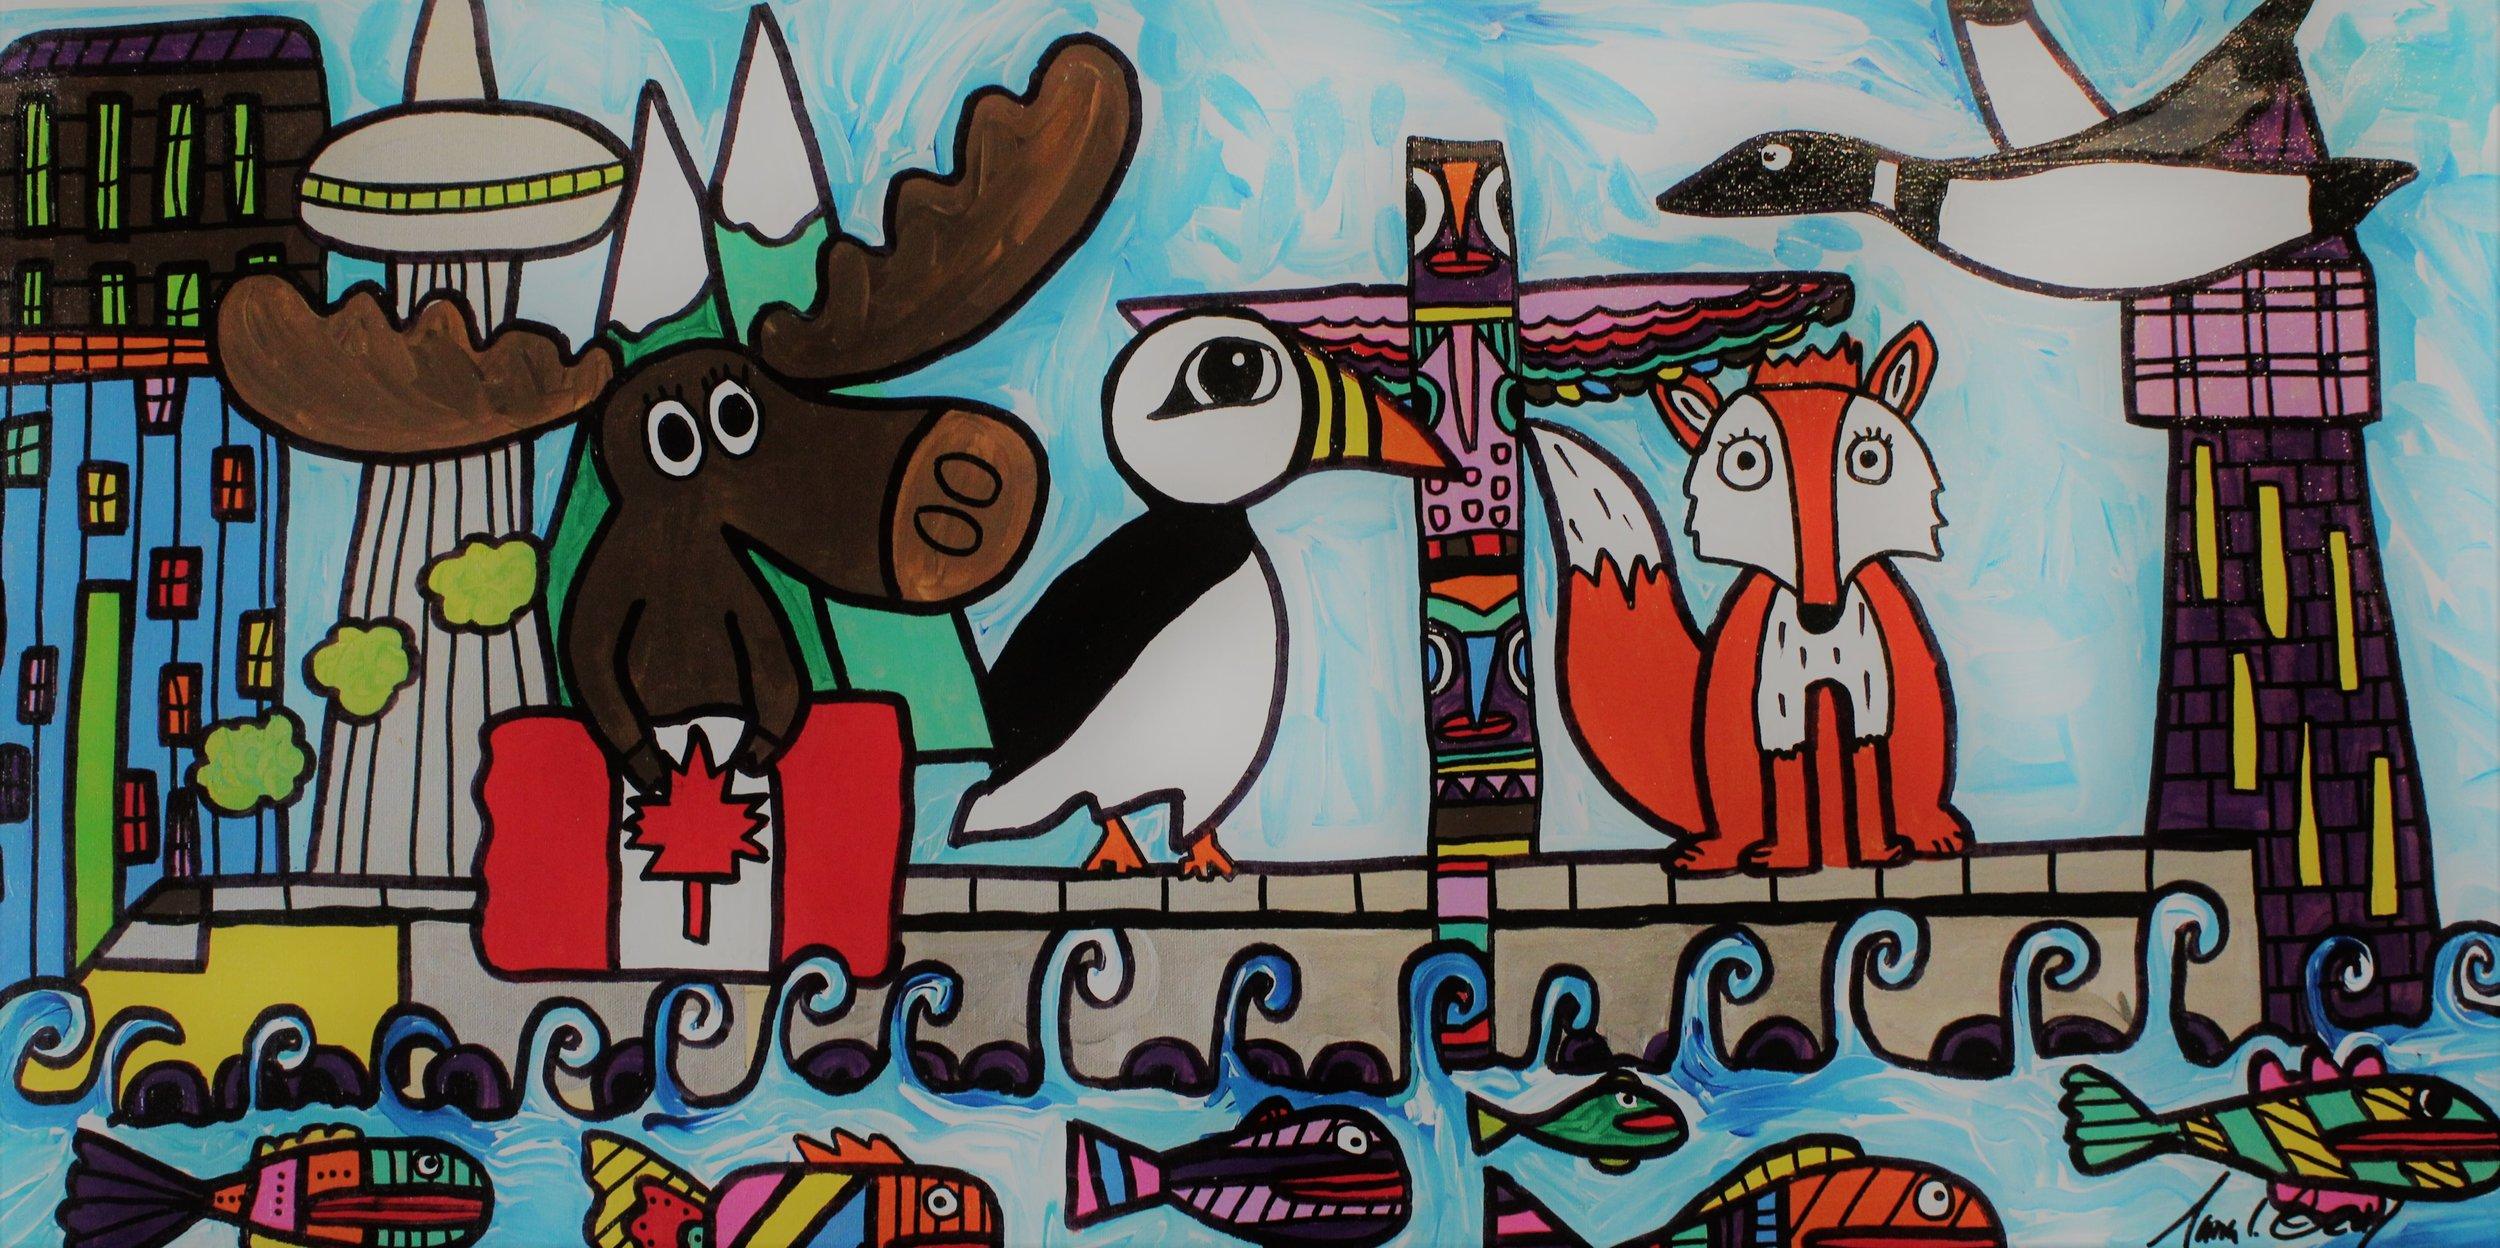 Image2_UncommonJoy_Artfest2019_A Glimpse of Canada.jpg.JPG